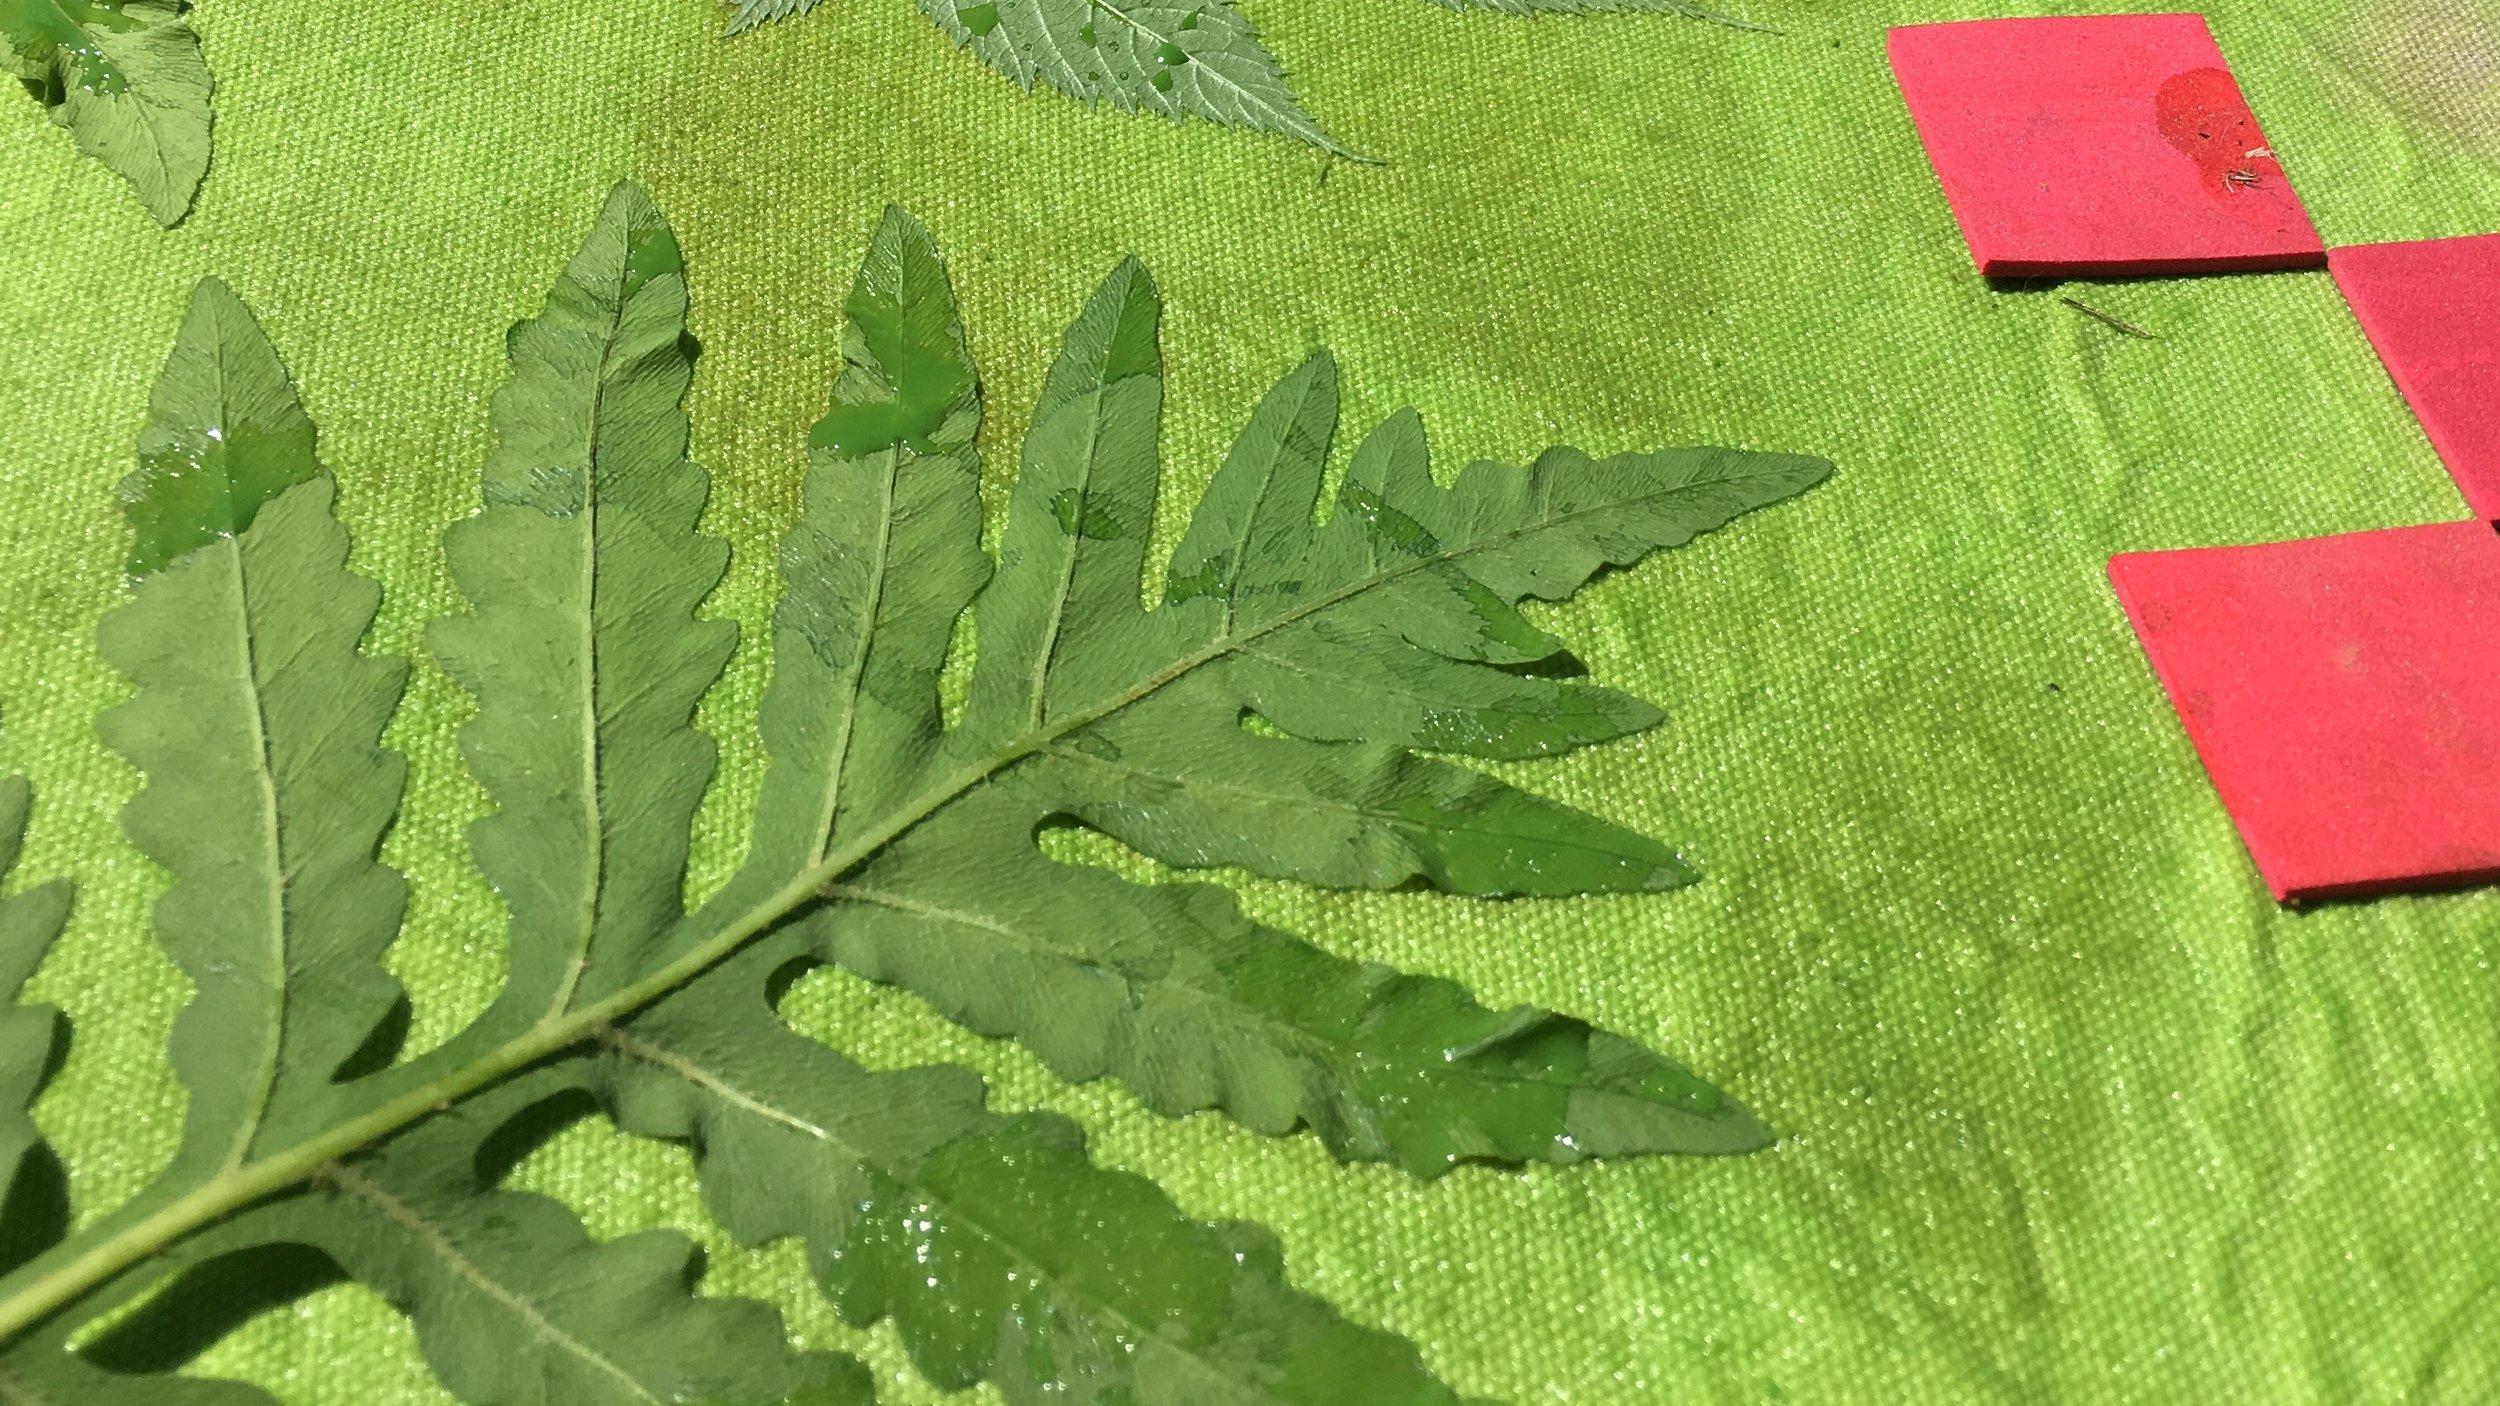 Sensitive fern and craft foam squares